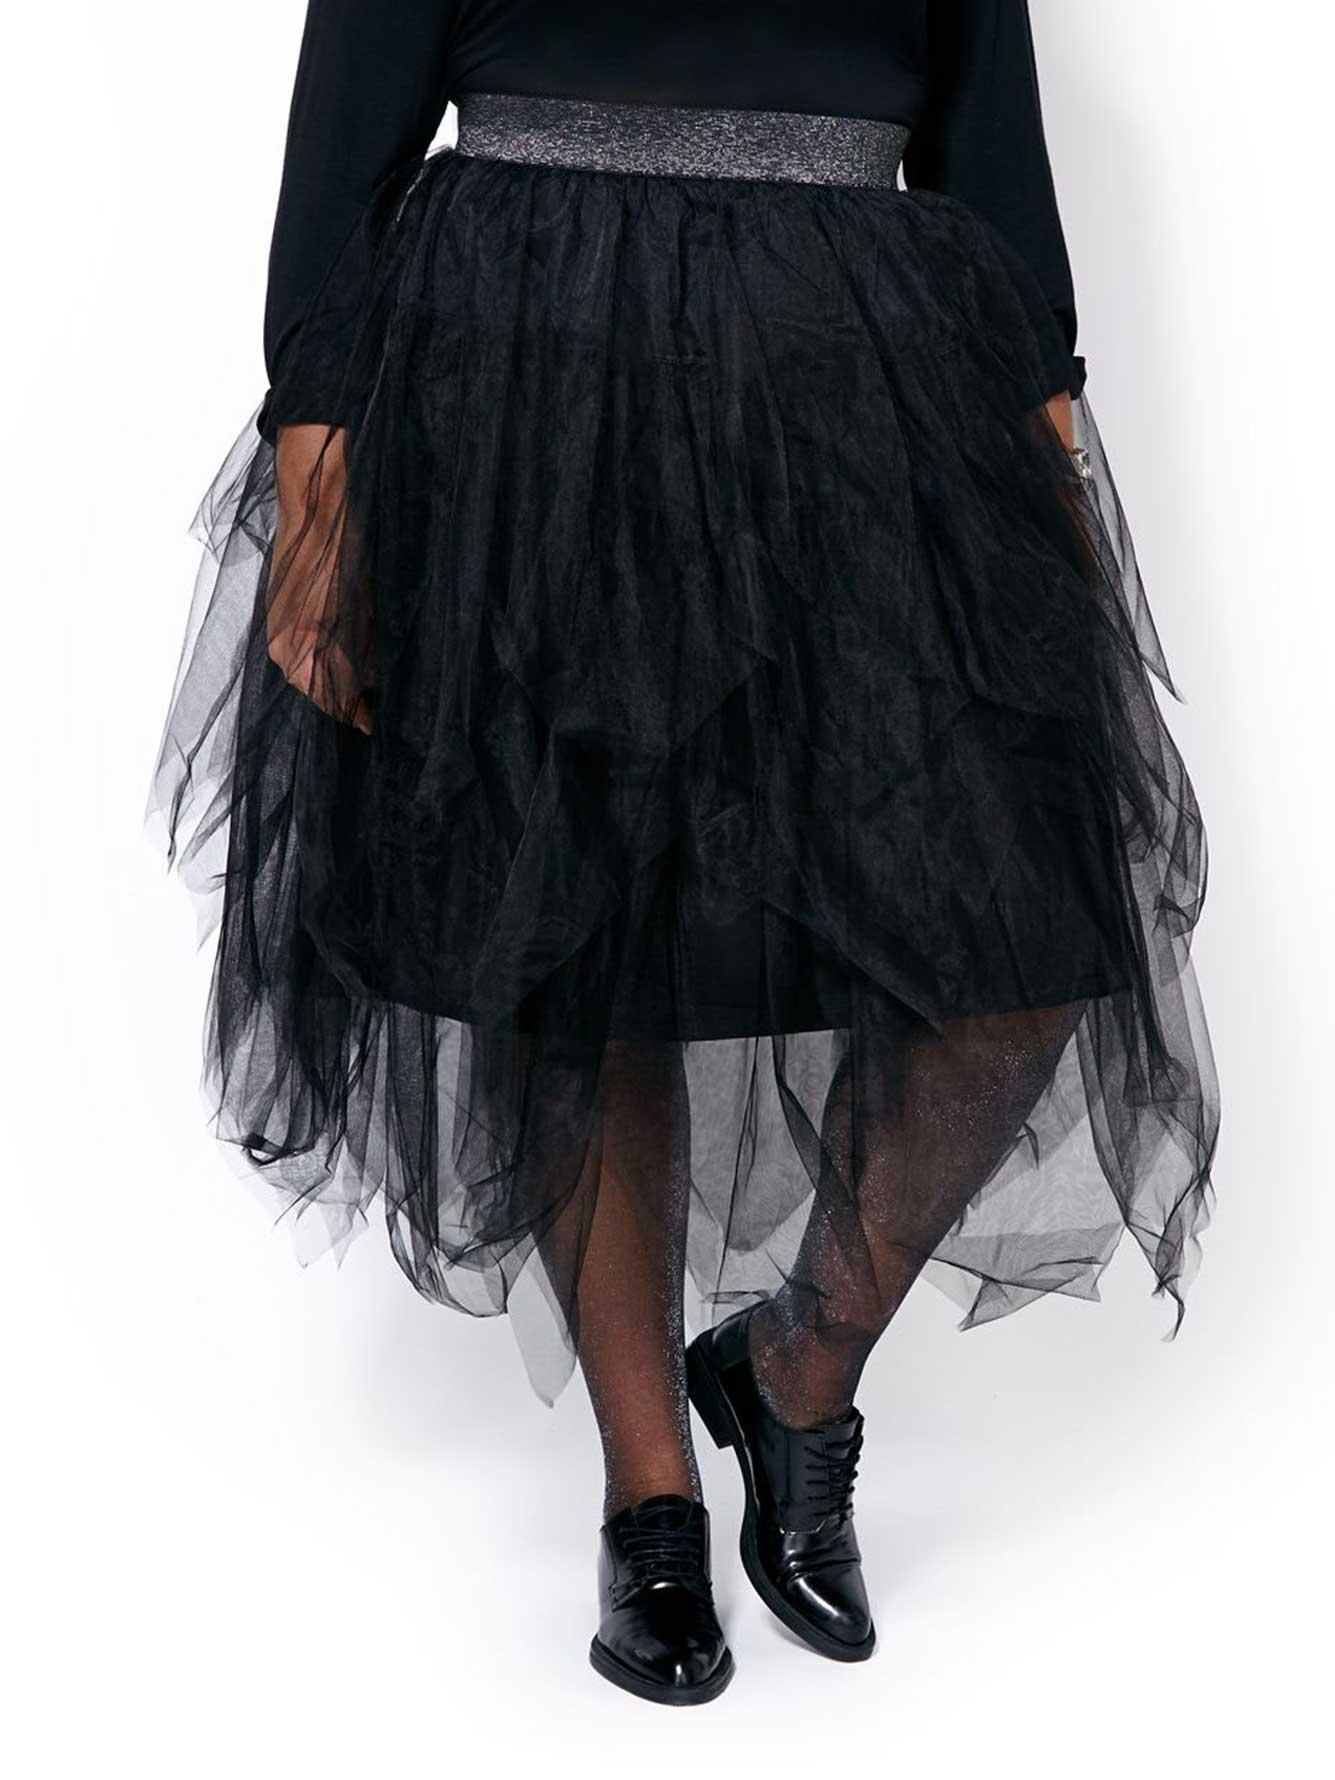 b2be9296424 MELISSA McCARTHY Layered Tulle Skirt